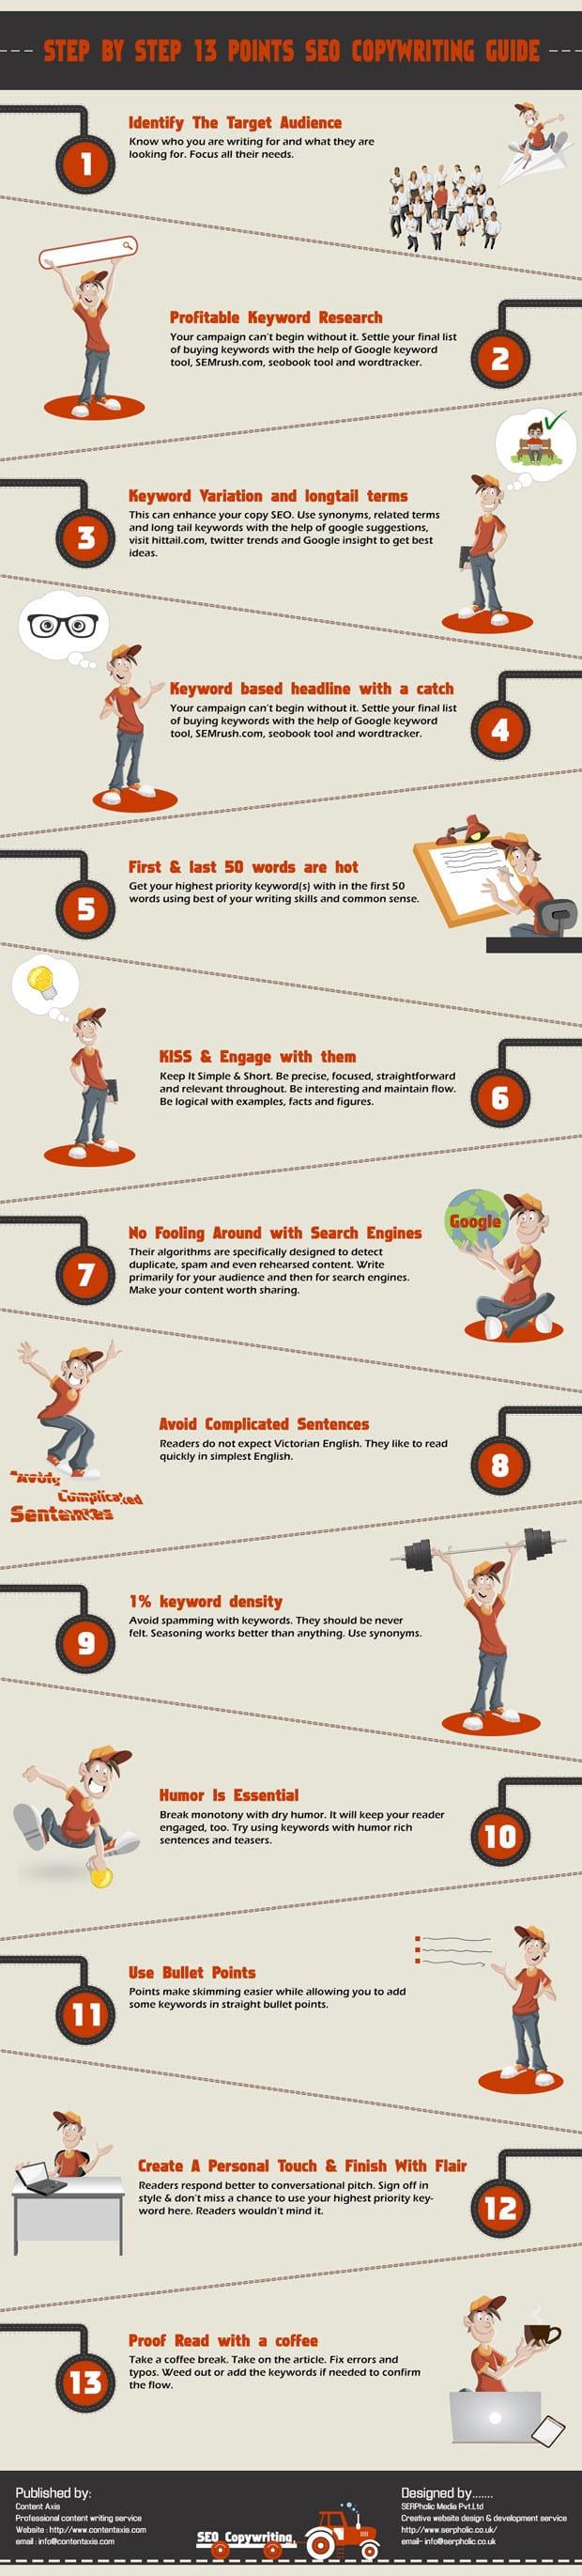 13 Step Copywriting Guide Infographic